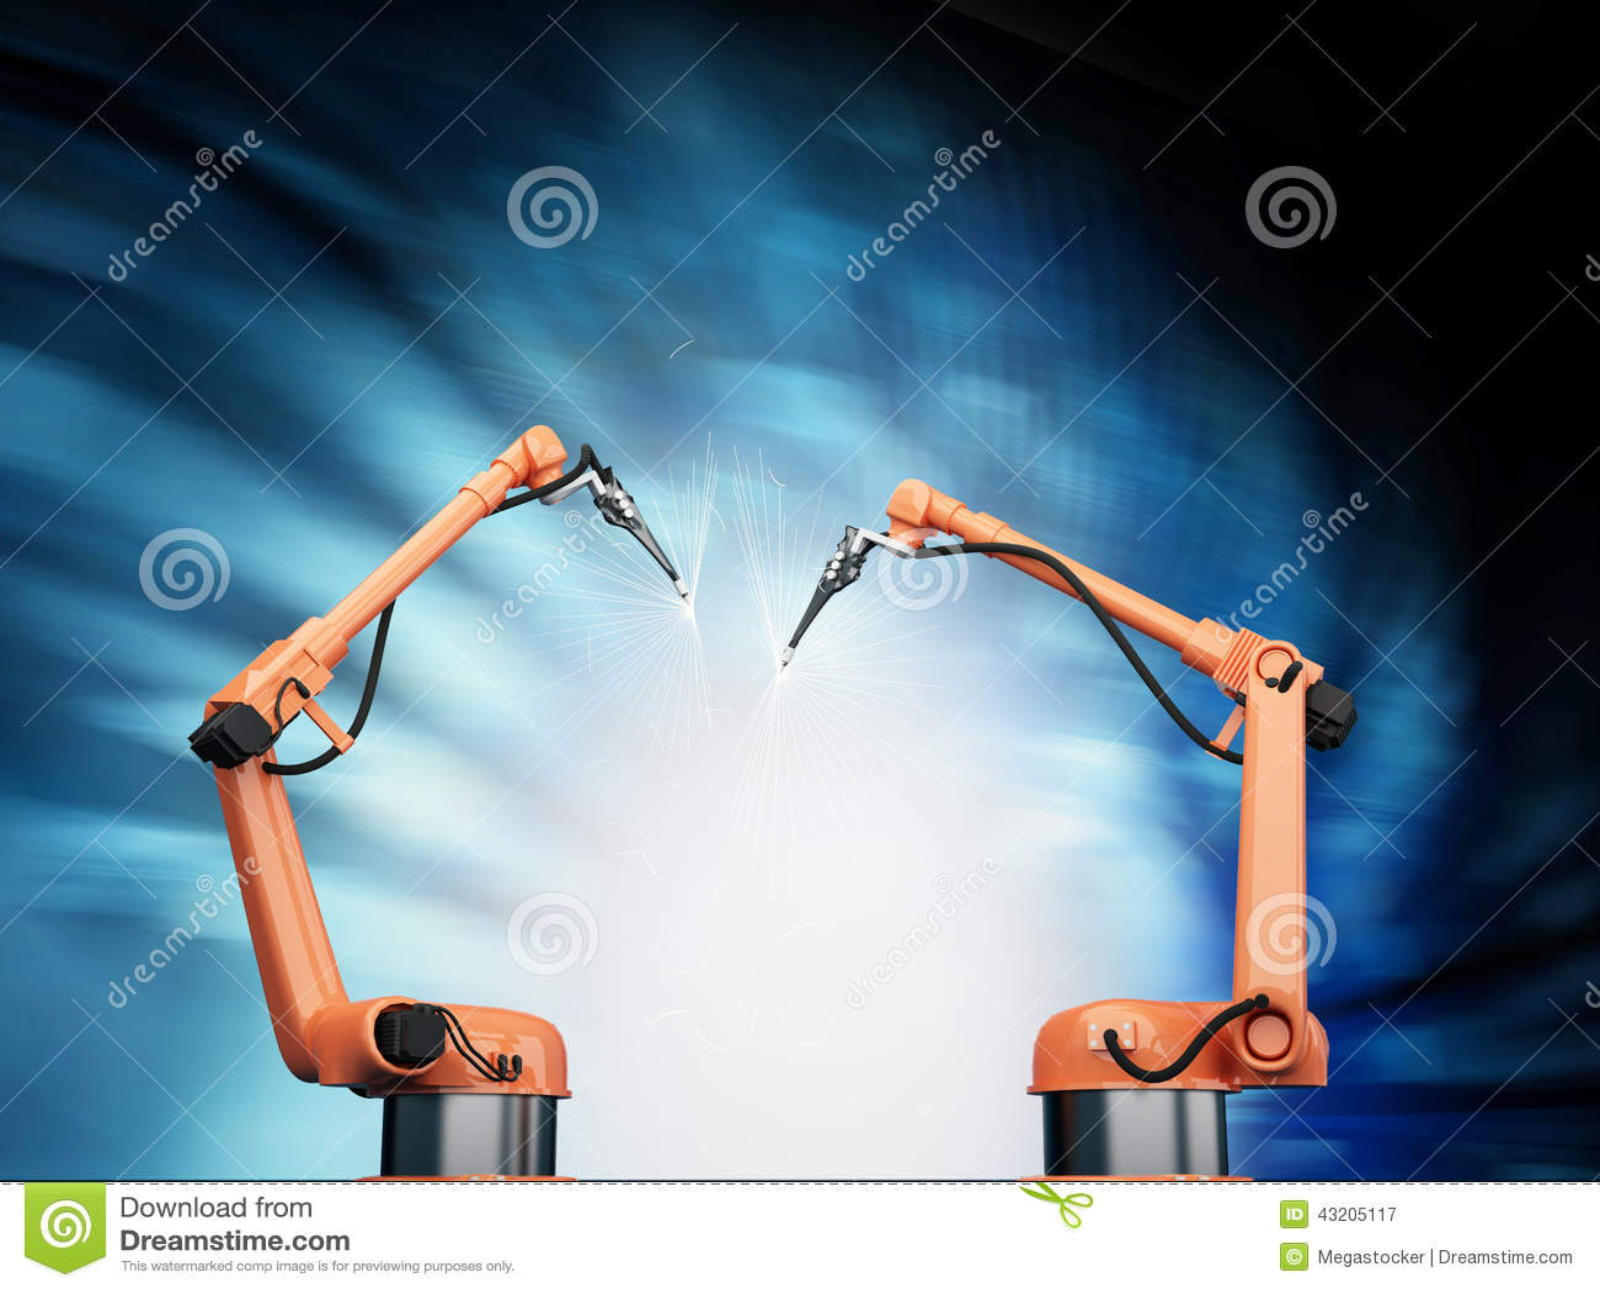 Download Industriella Robotic armar stock illustrationer. Illustration av industriellt - 43205117